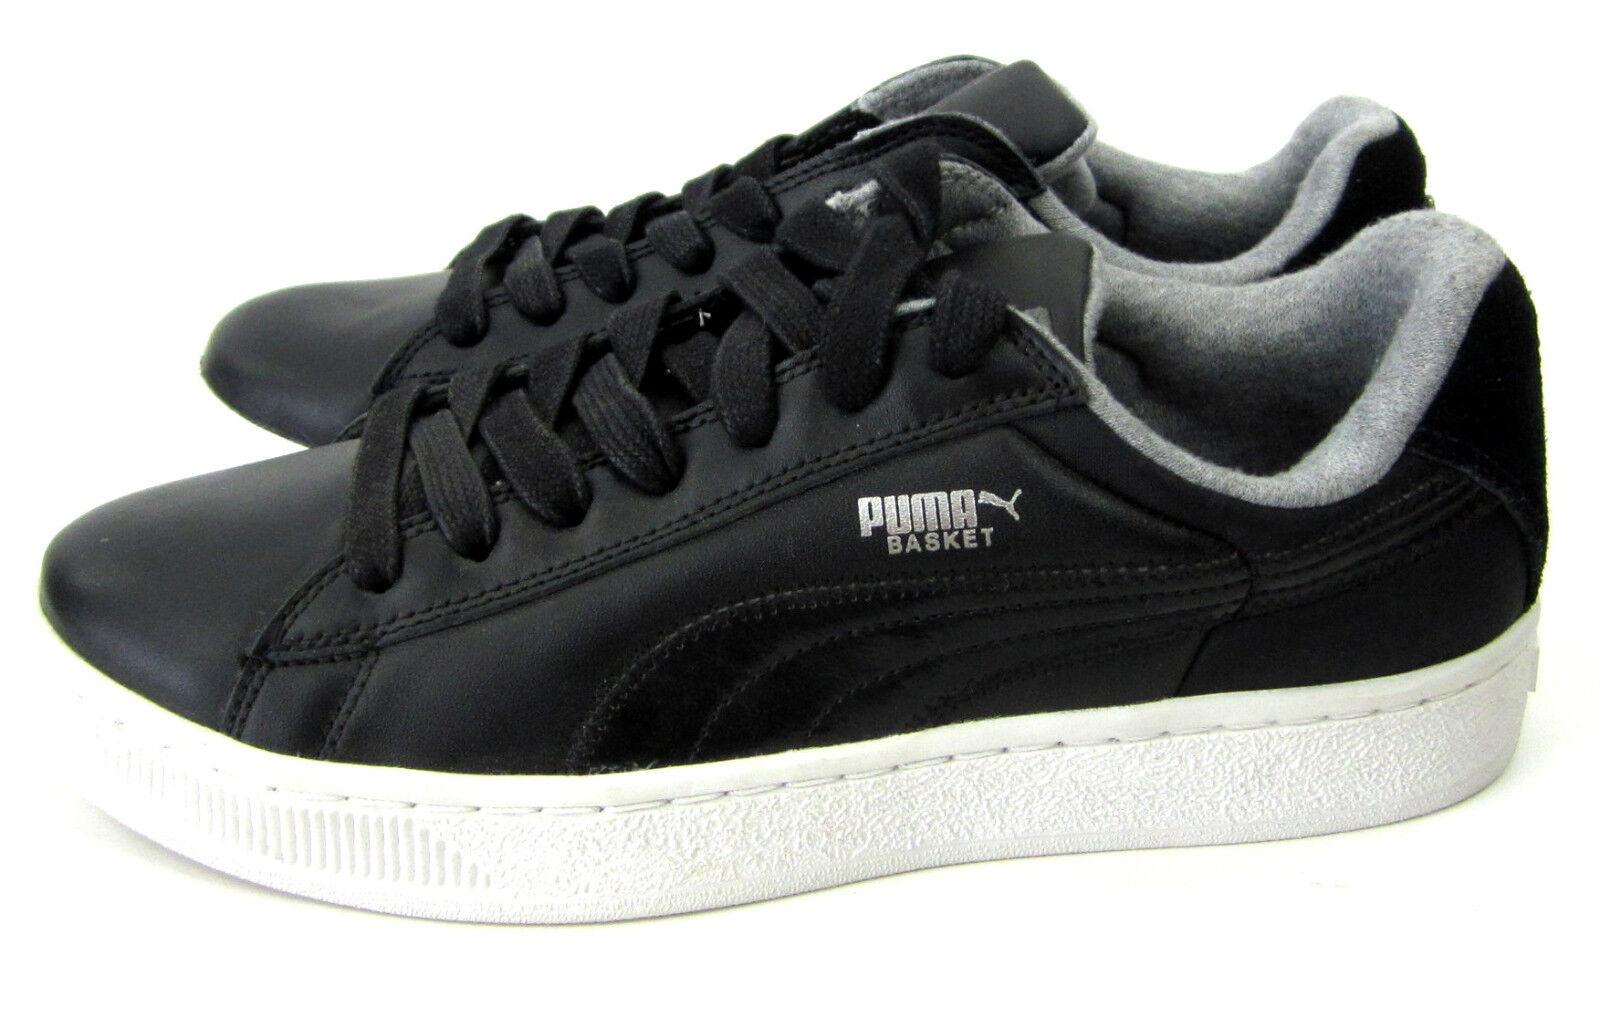 Puma scarpe Basket Basket Basket RLS Retro Leather nero bianca grigio scarpe da ginnastica Dimensione 8 a1e716